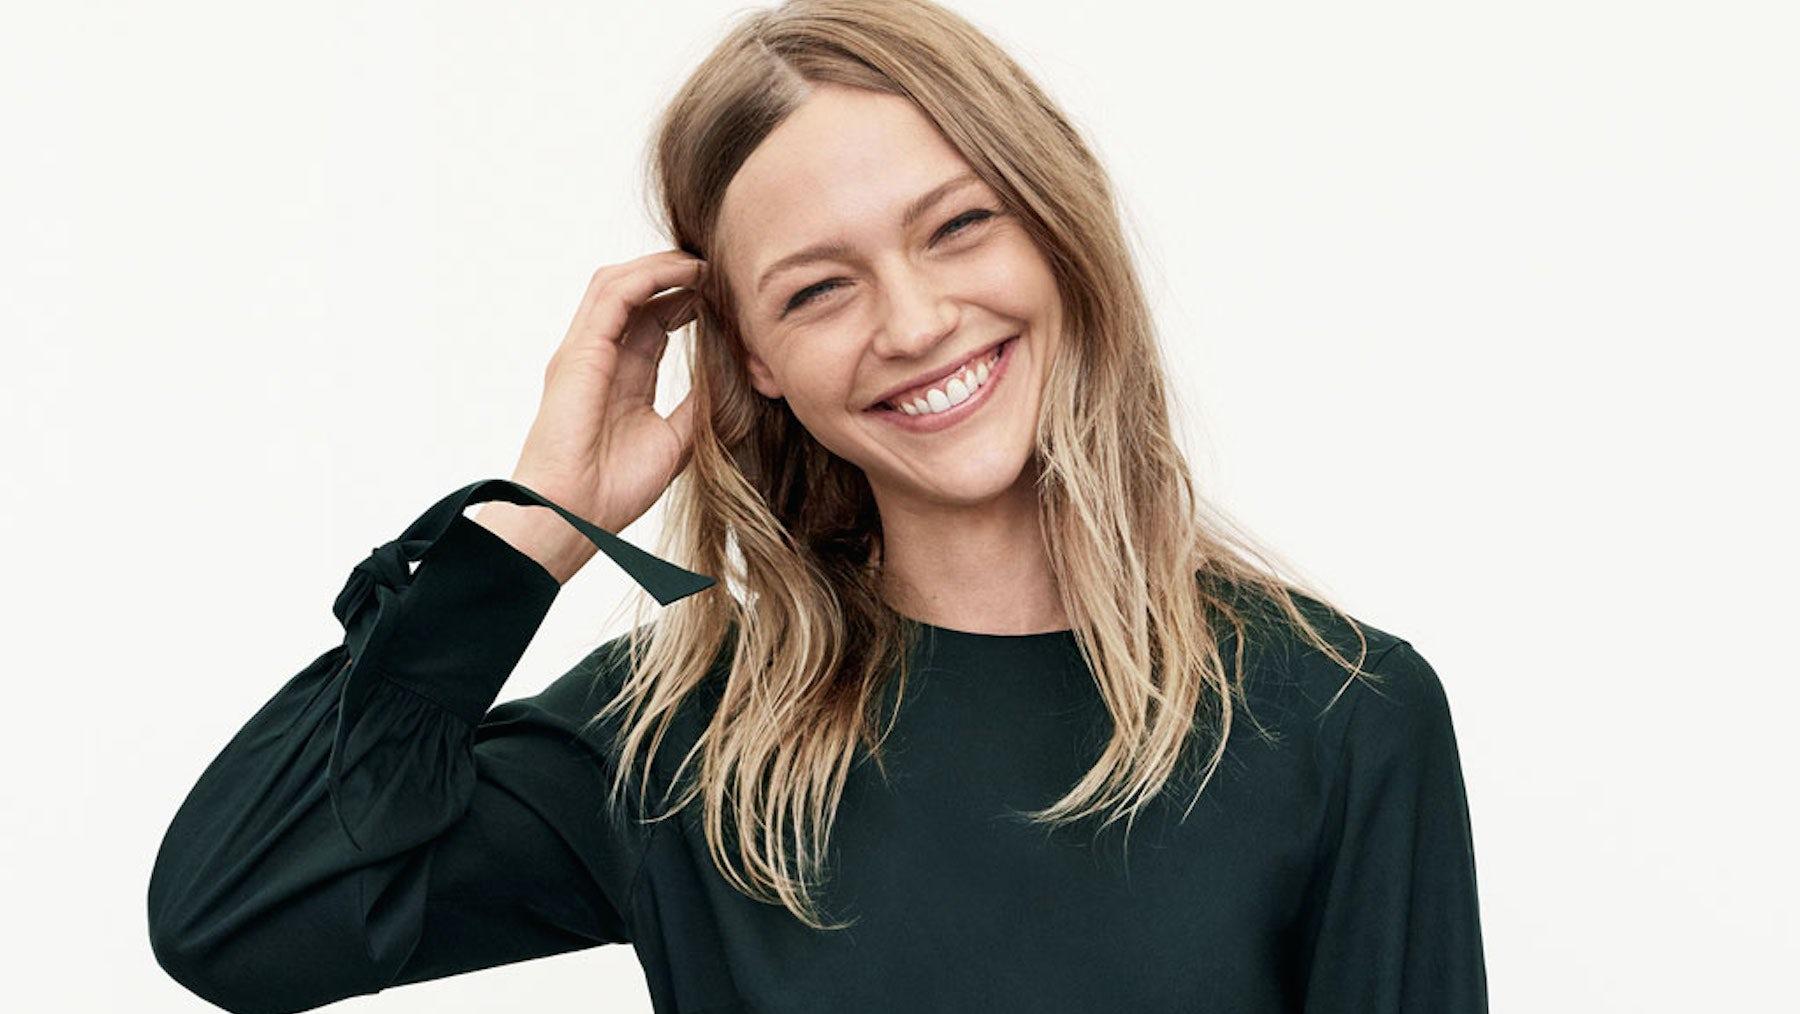 Social Goods | Zara's Eco-Friendly Line, Marc Jacobs Dreadlocks, Sports Direct Investigation